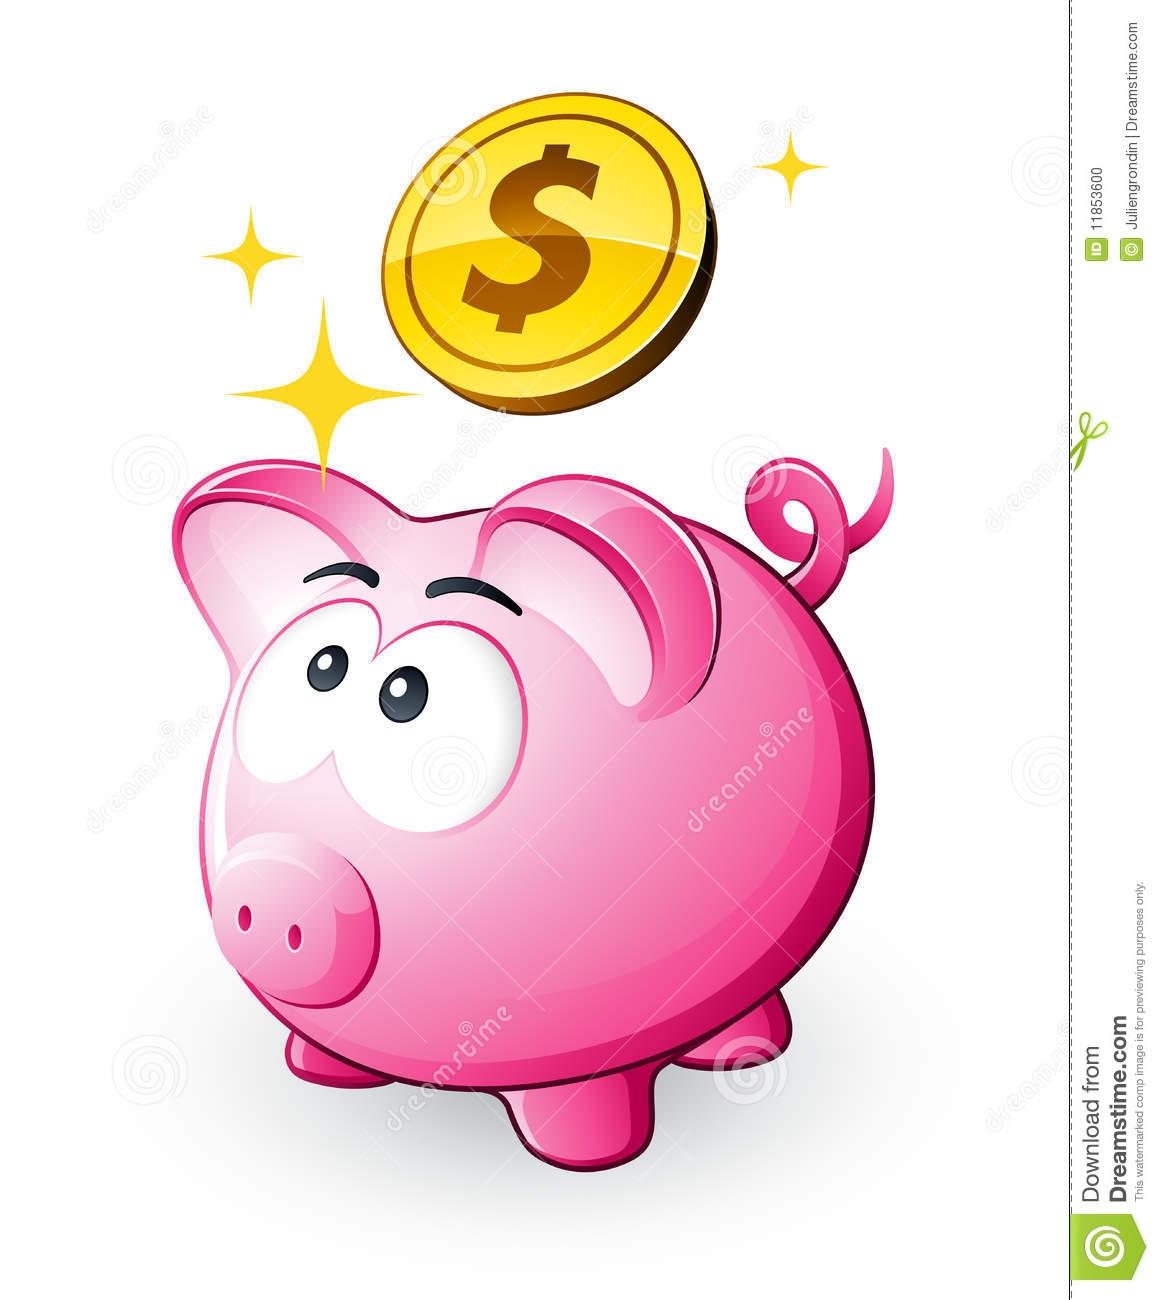 Cute Money Clipart.